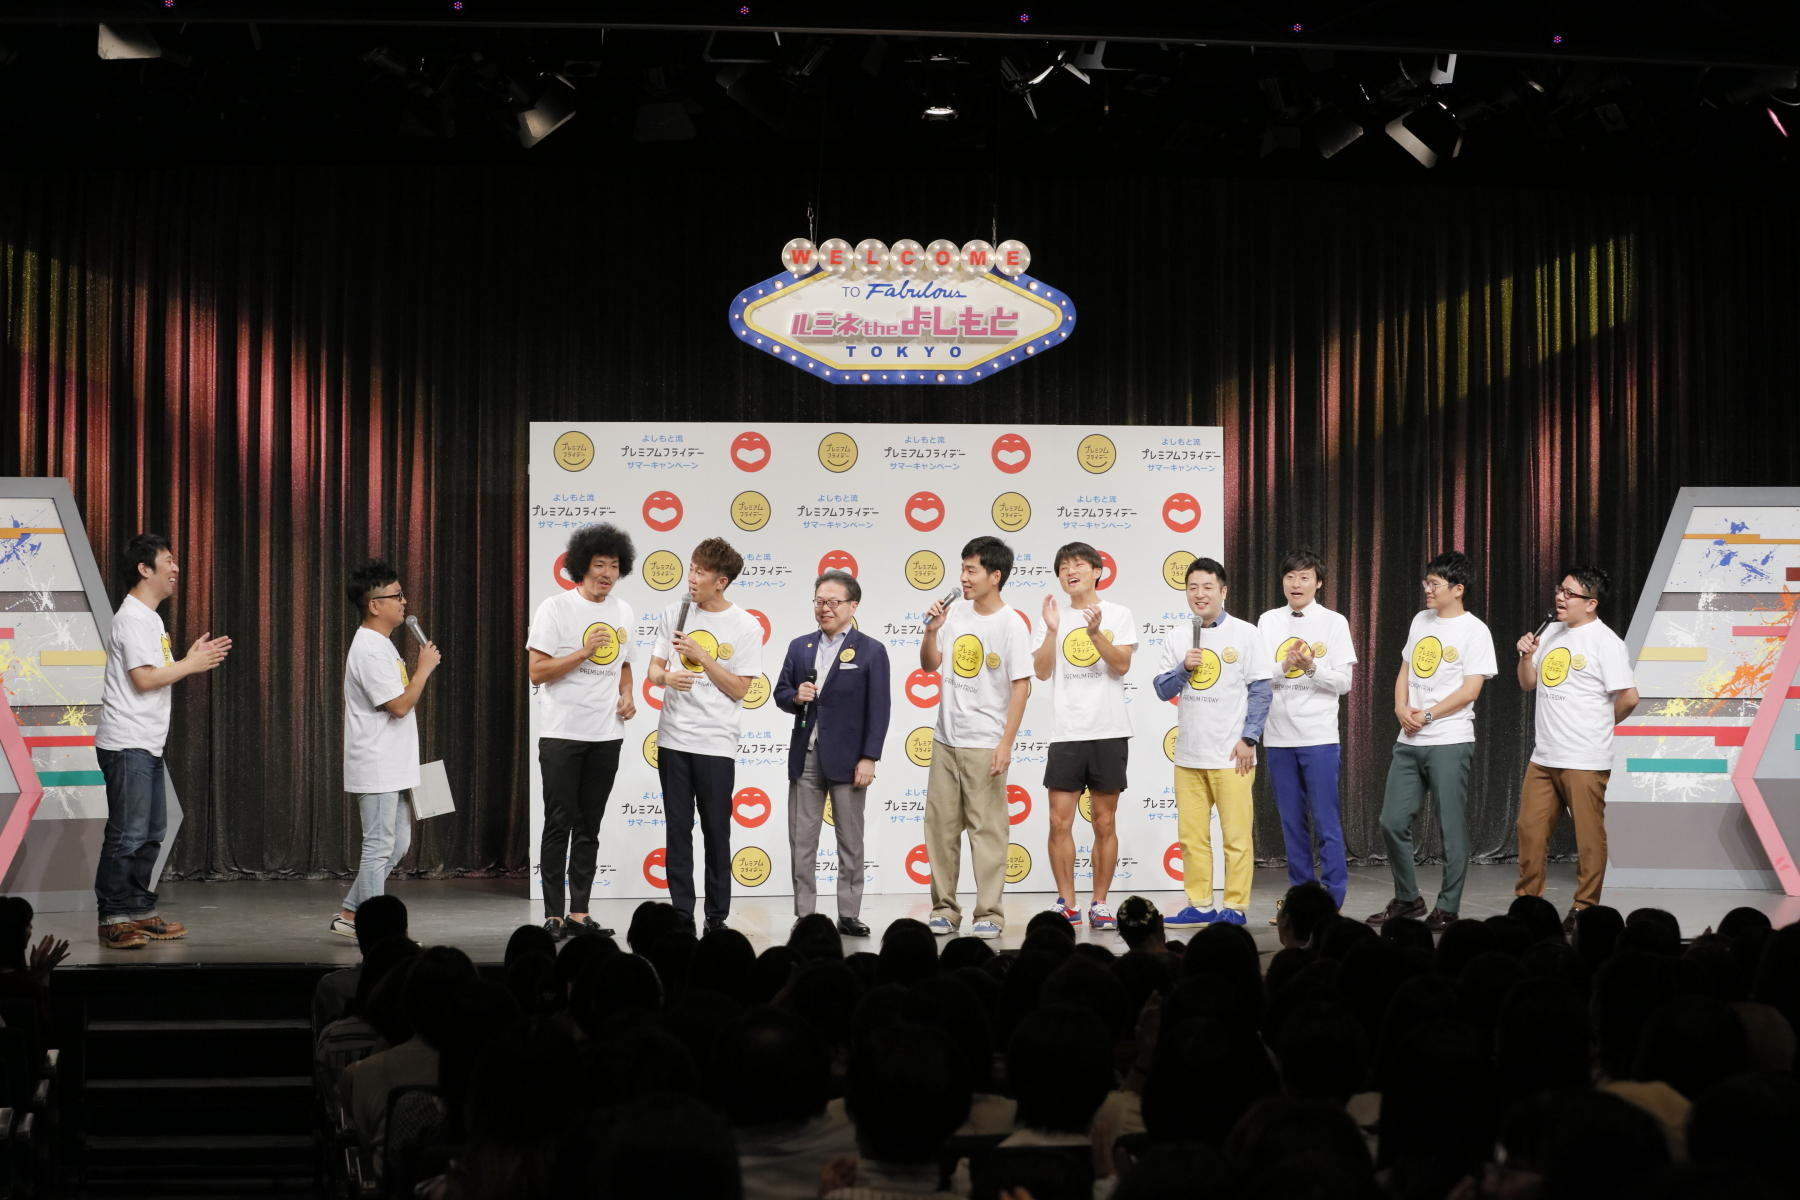 http://news.yoshimoto.co.jp/20180727225233-50efb7335c9d217edda9ffceb1708a8f0f028694.jpg